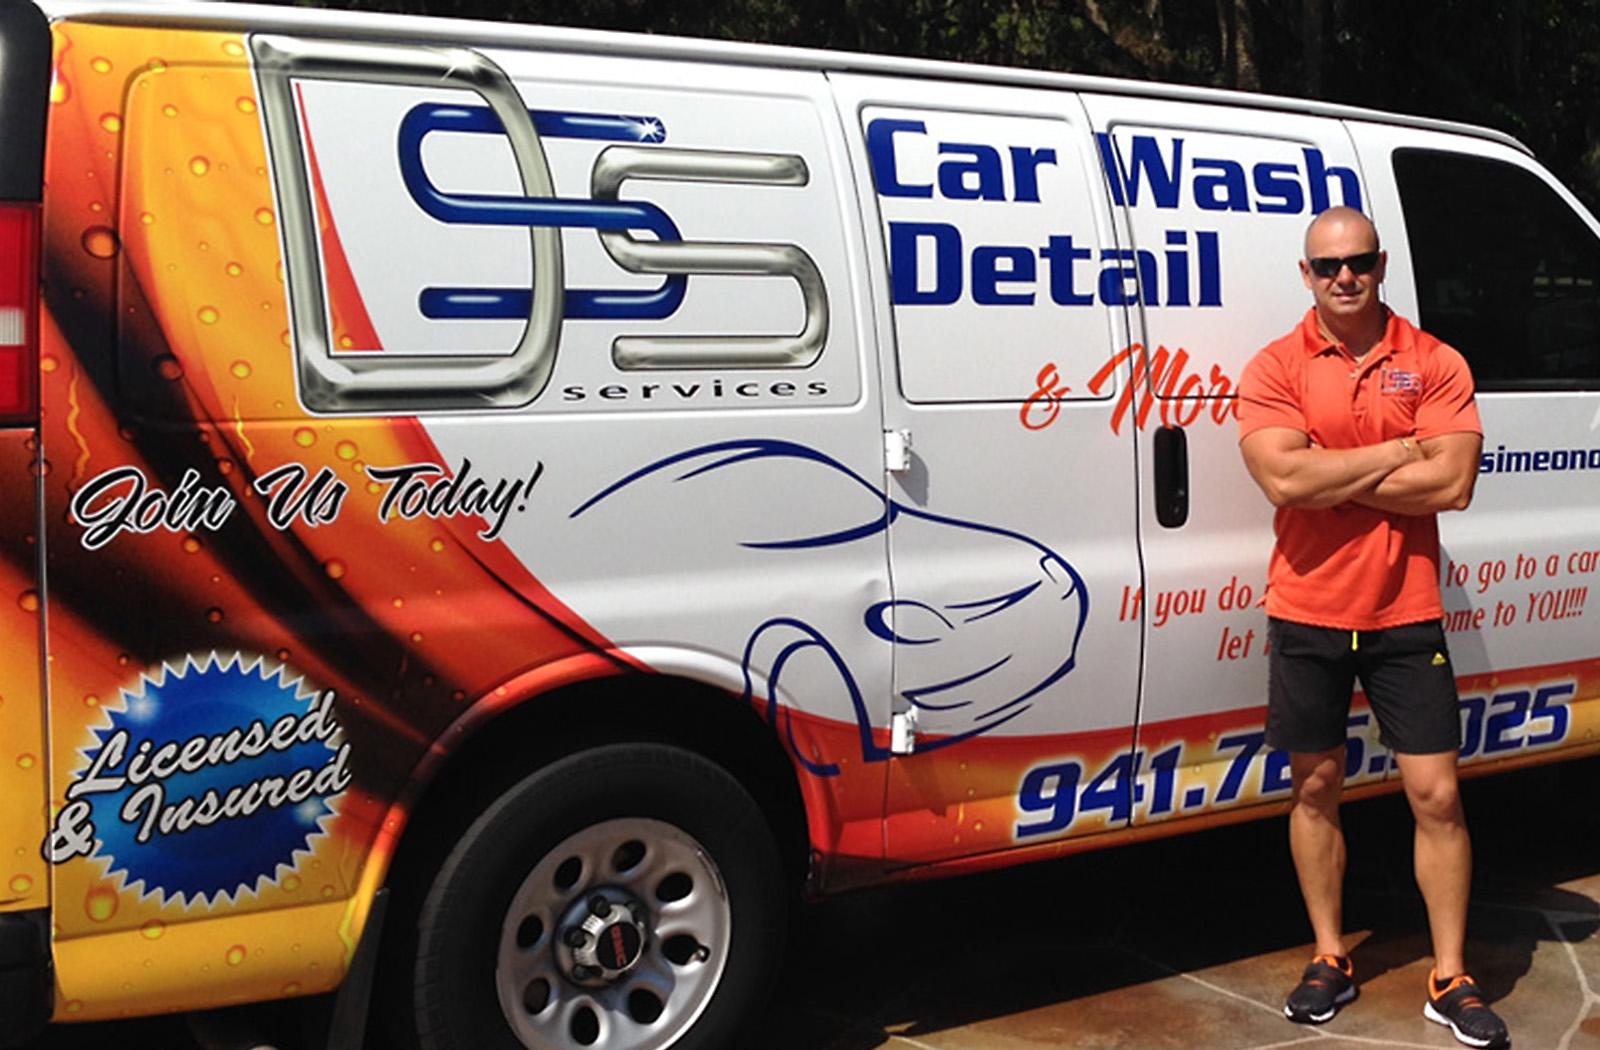 Mobile Detailing Car cleaning in Sarasota